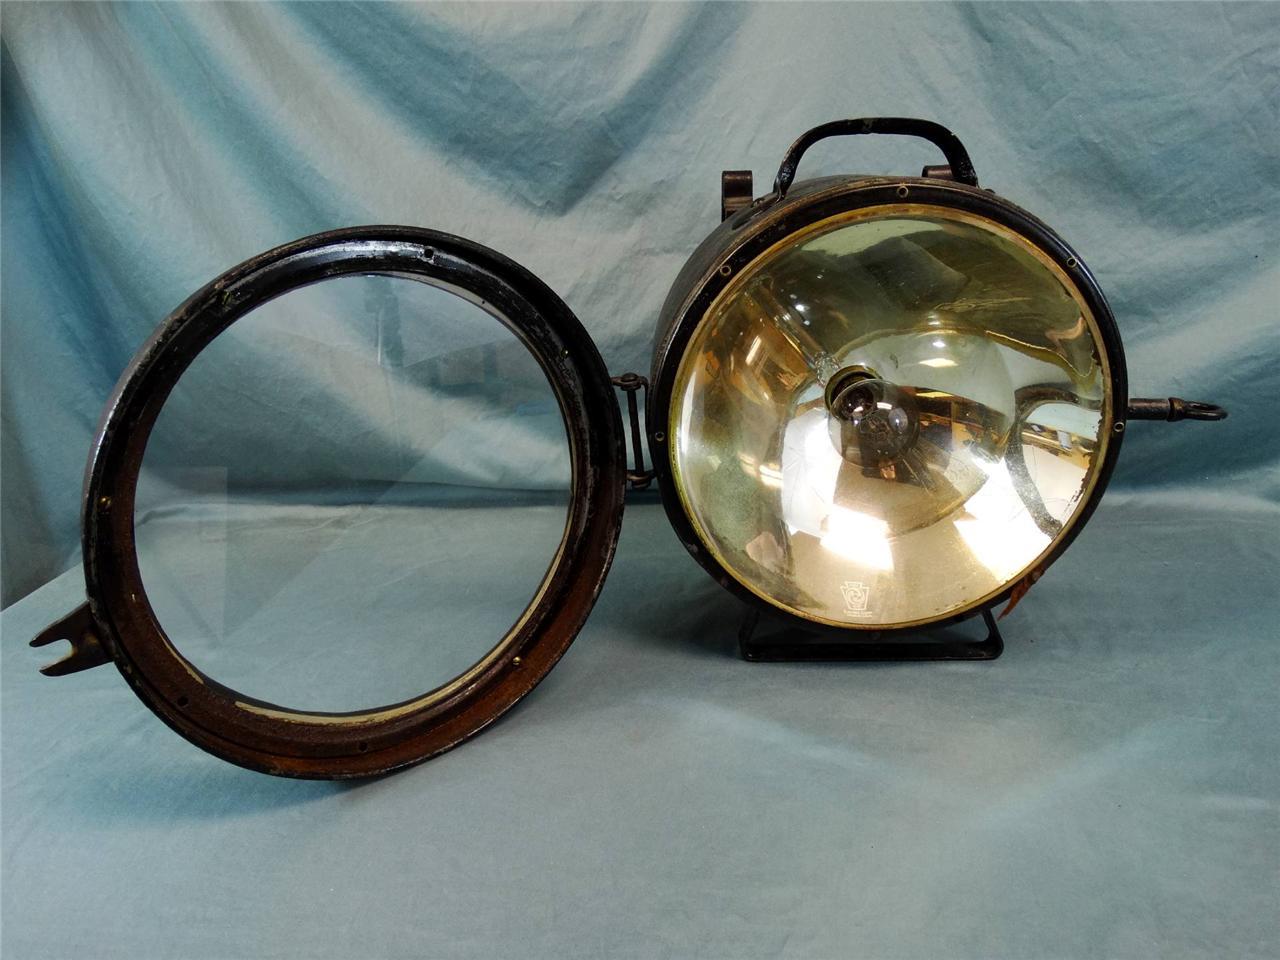 Antique Train Headlight : Antique rare golden glow t railroad locomotive